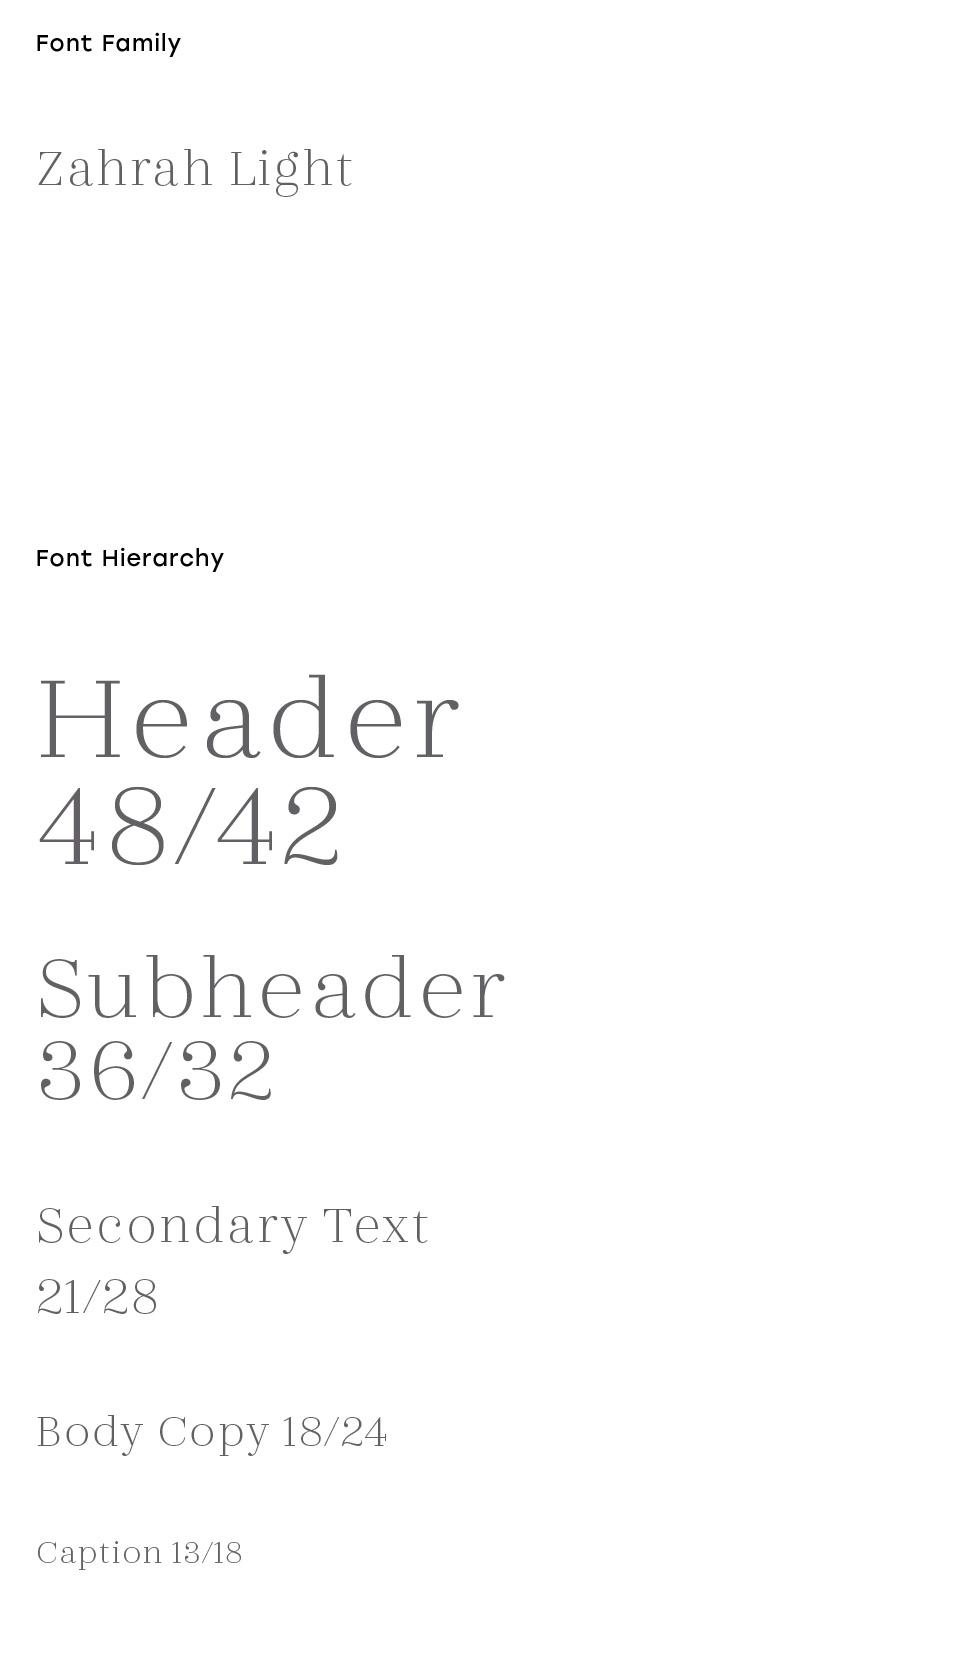 design-system-font-family-1